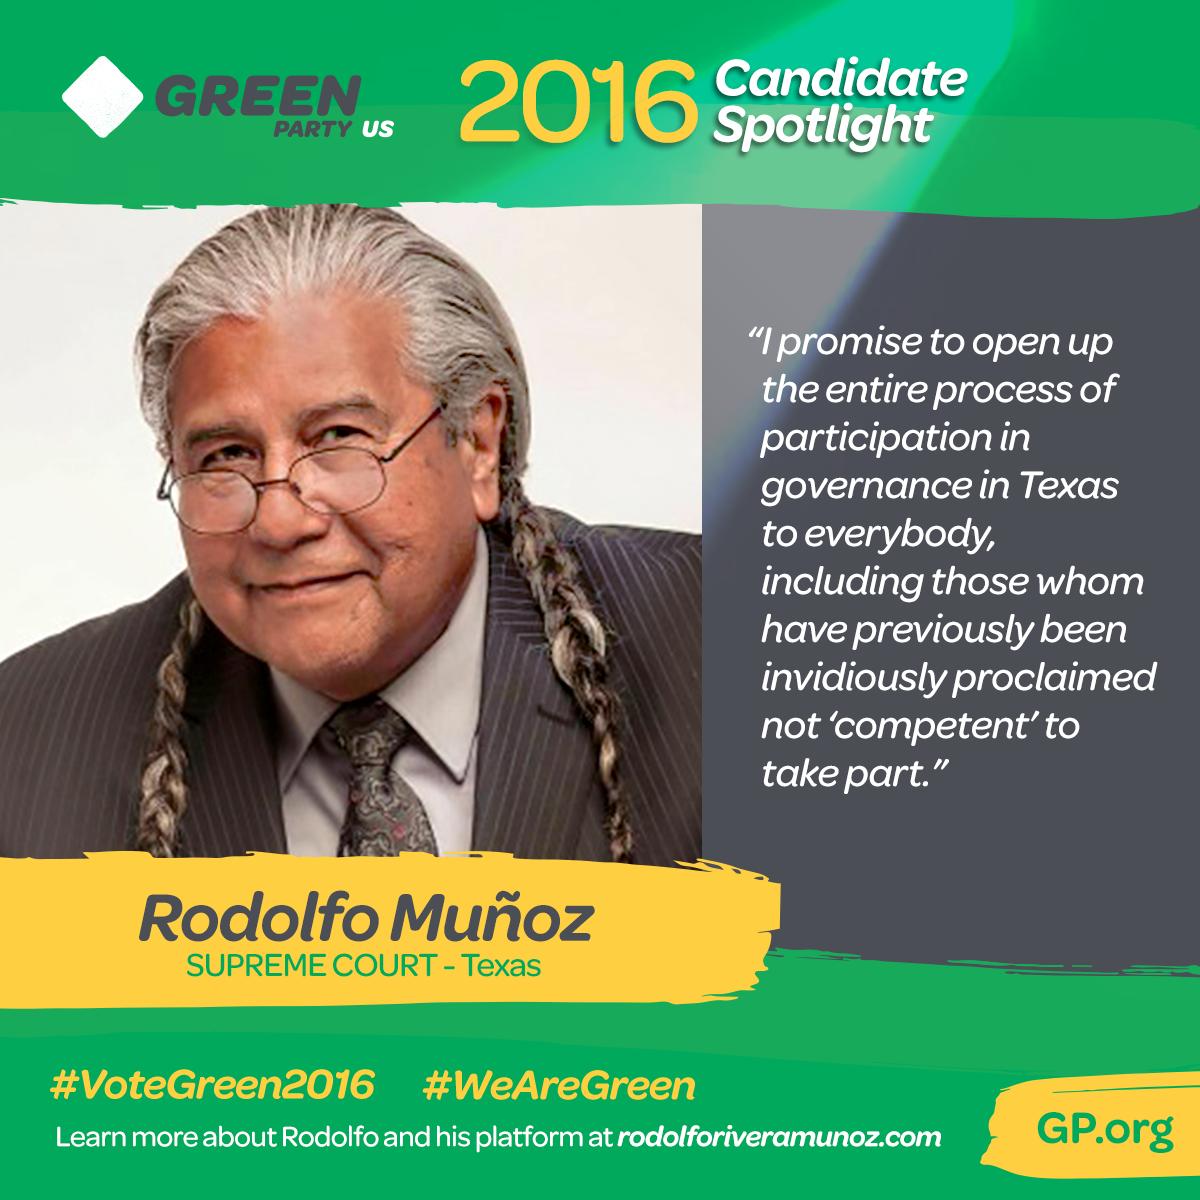 GPUS_m_Candidate-Spotlight_Rodolfo-Munoz.png